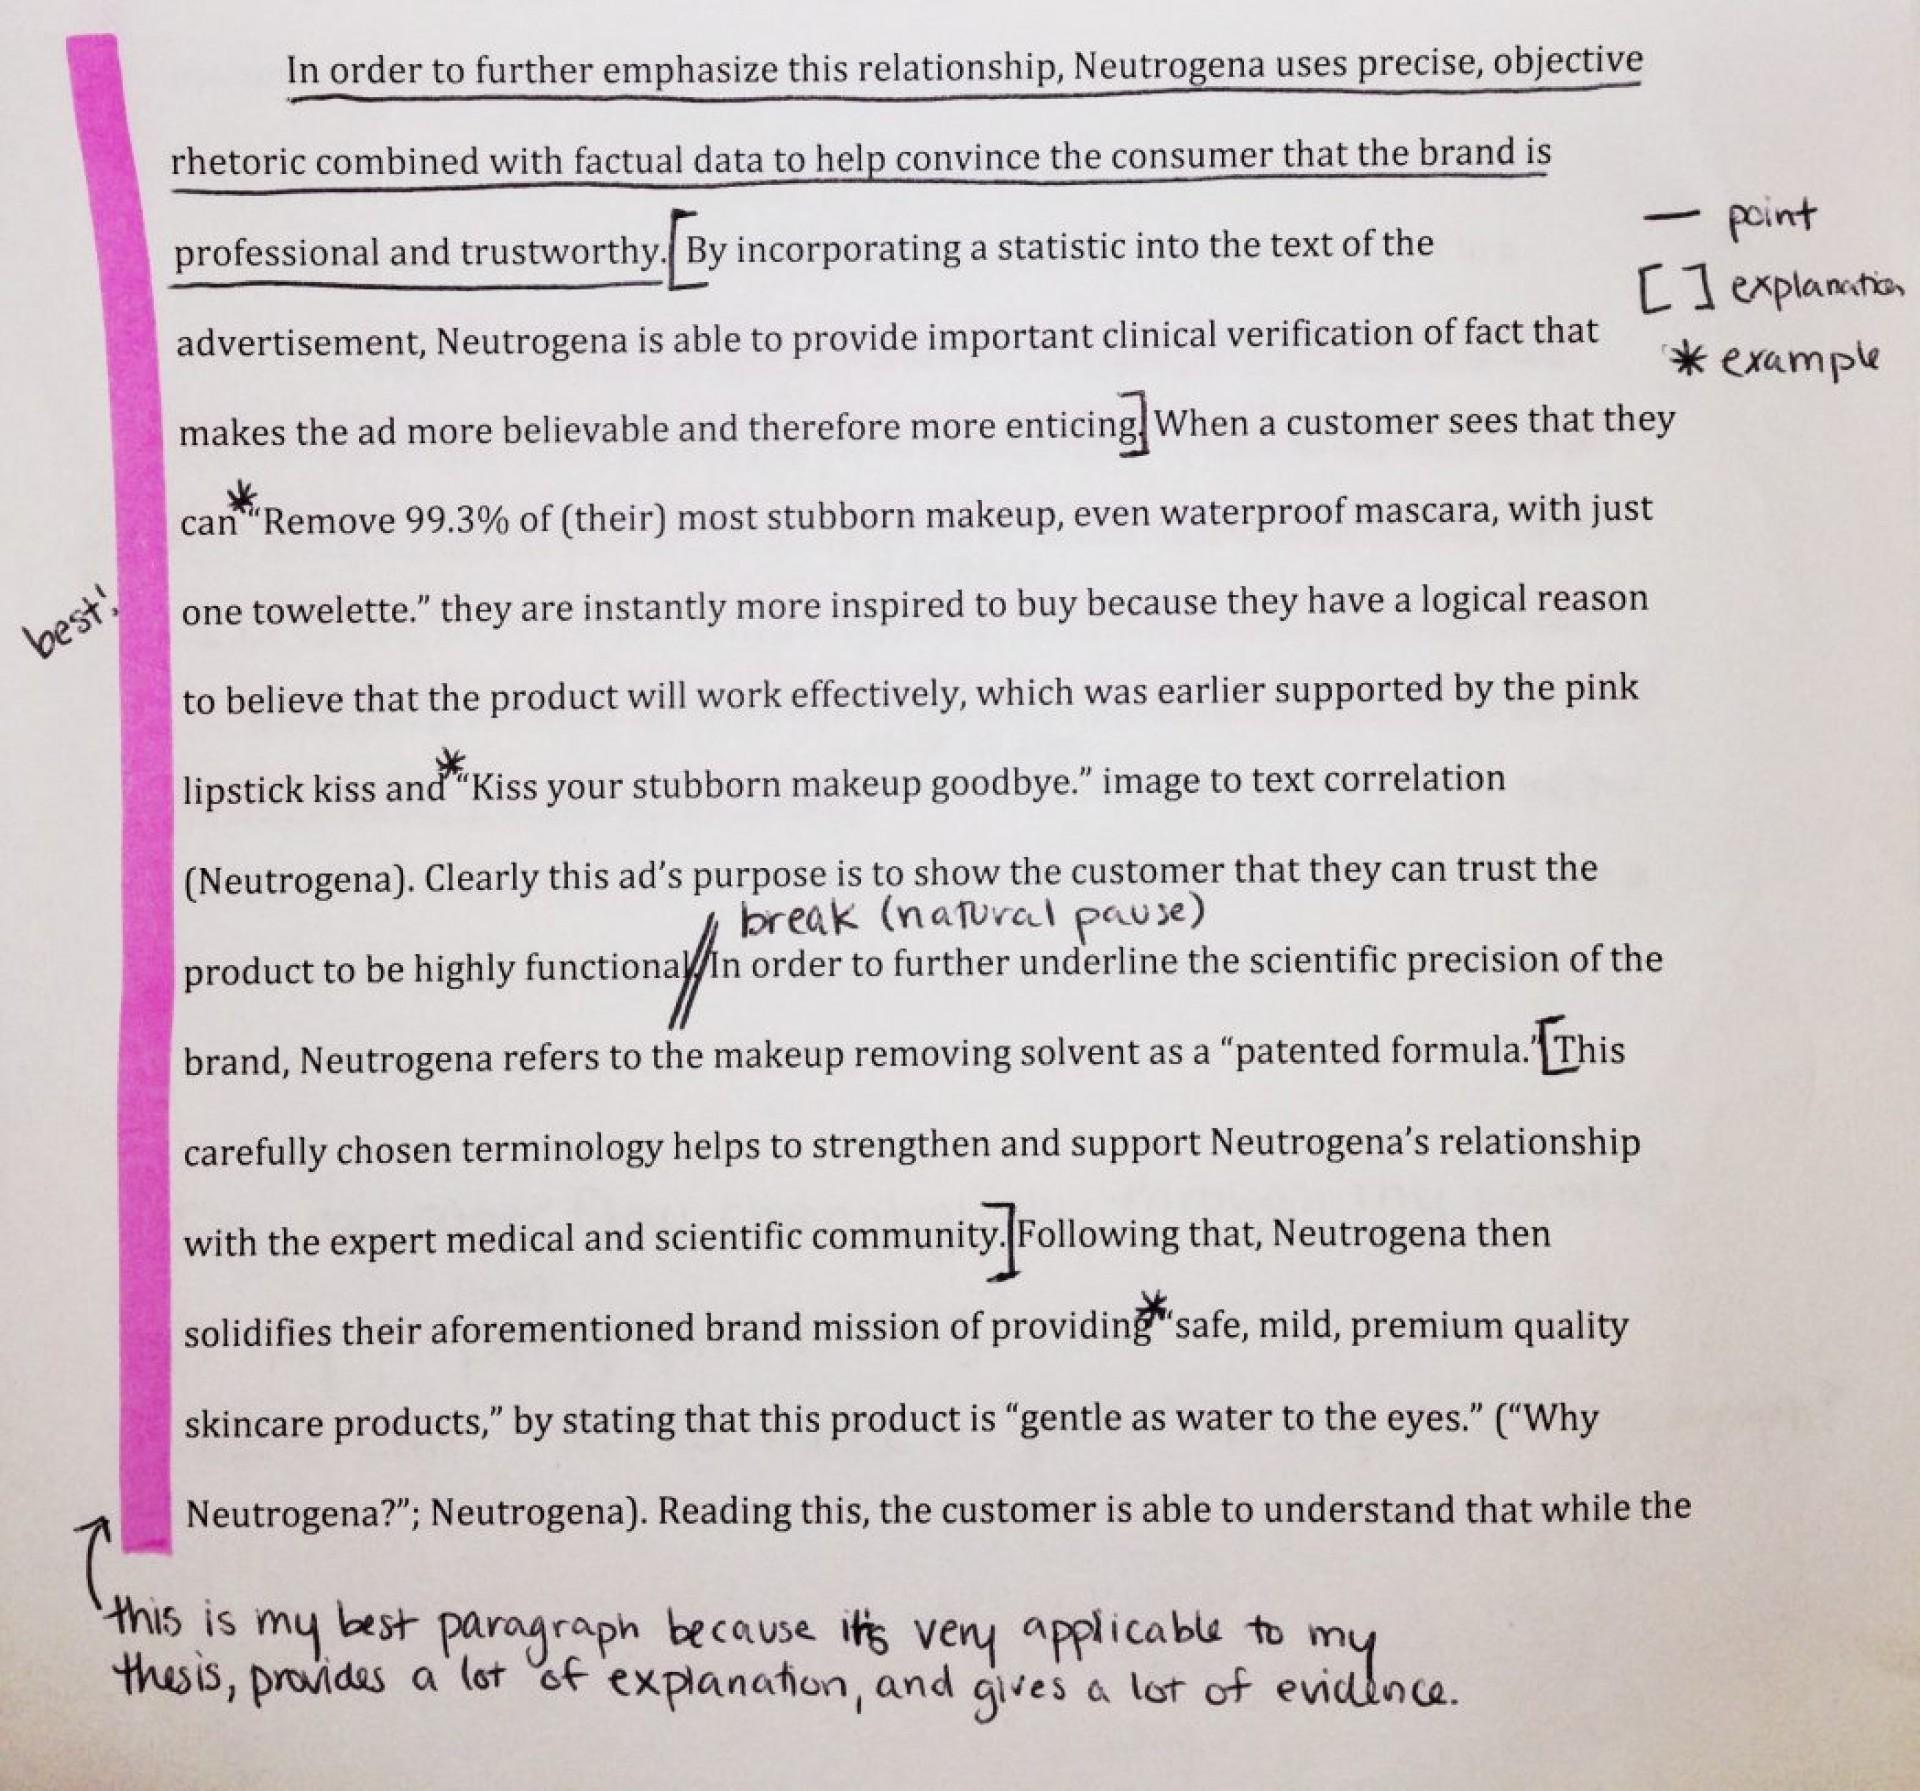 013 Essay Example Rhetorical Visual Rhetoric Of Essays Template Ph Analysis Examples Topics Impressive Ap Lang 2016 Devices English 1920